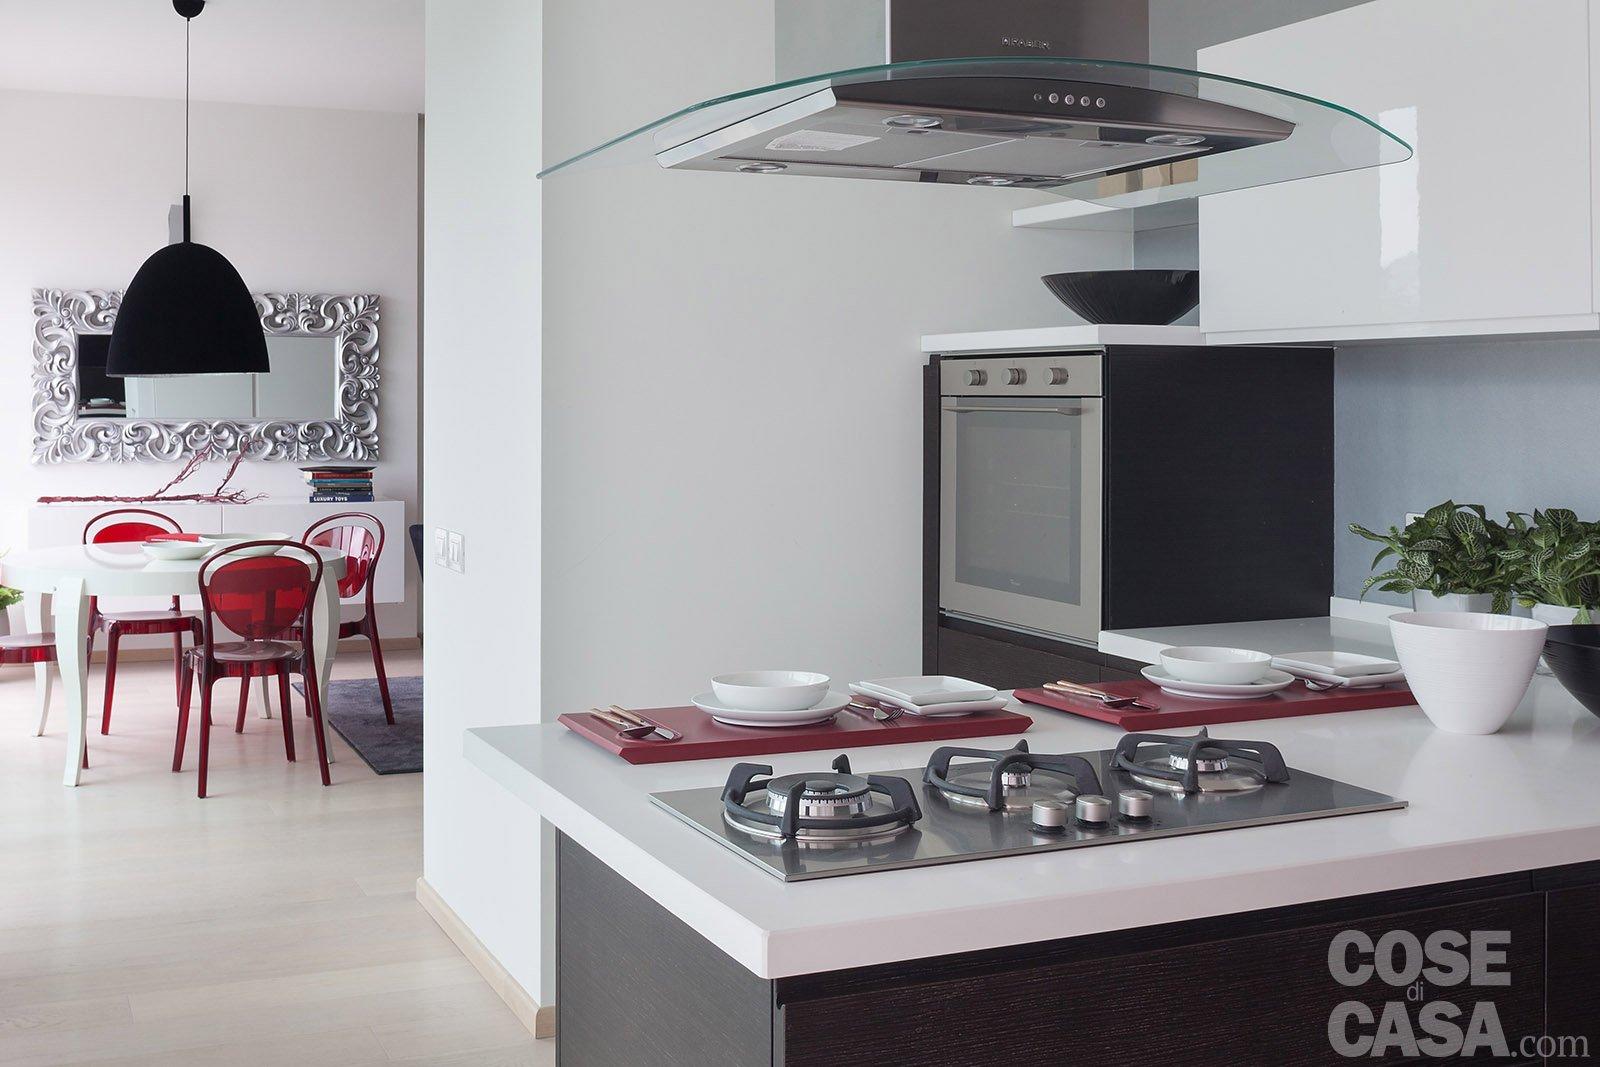 In meno di 100 mq una casa moderna con geometrie a 3 - Cucina piano cottura ...